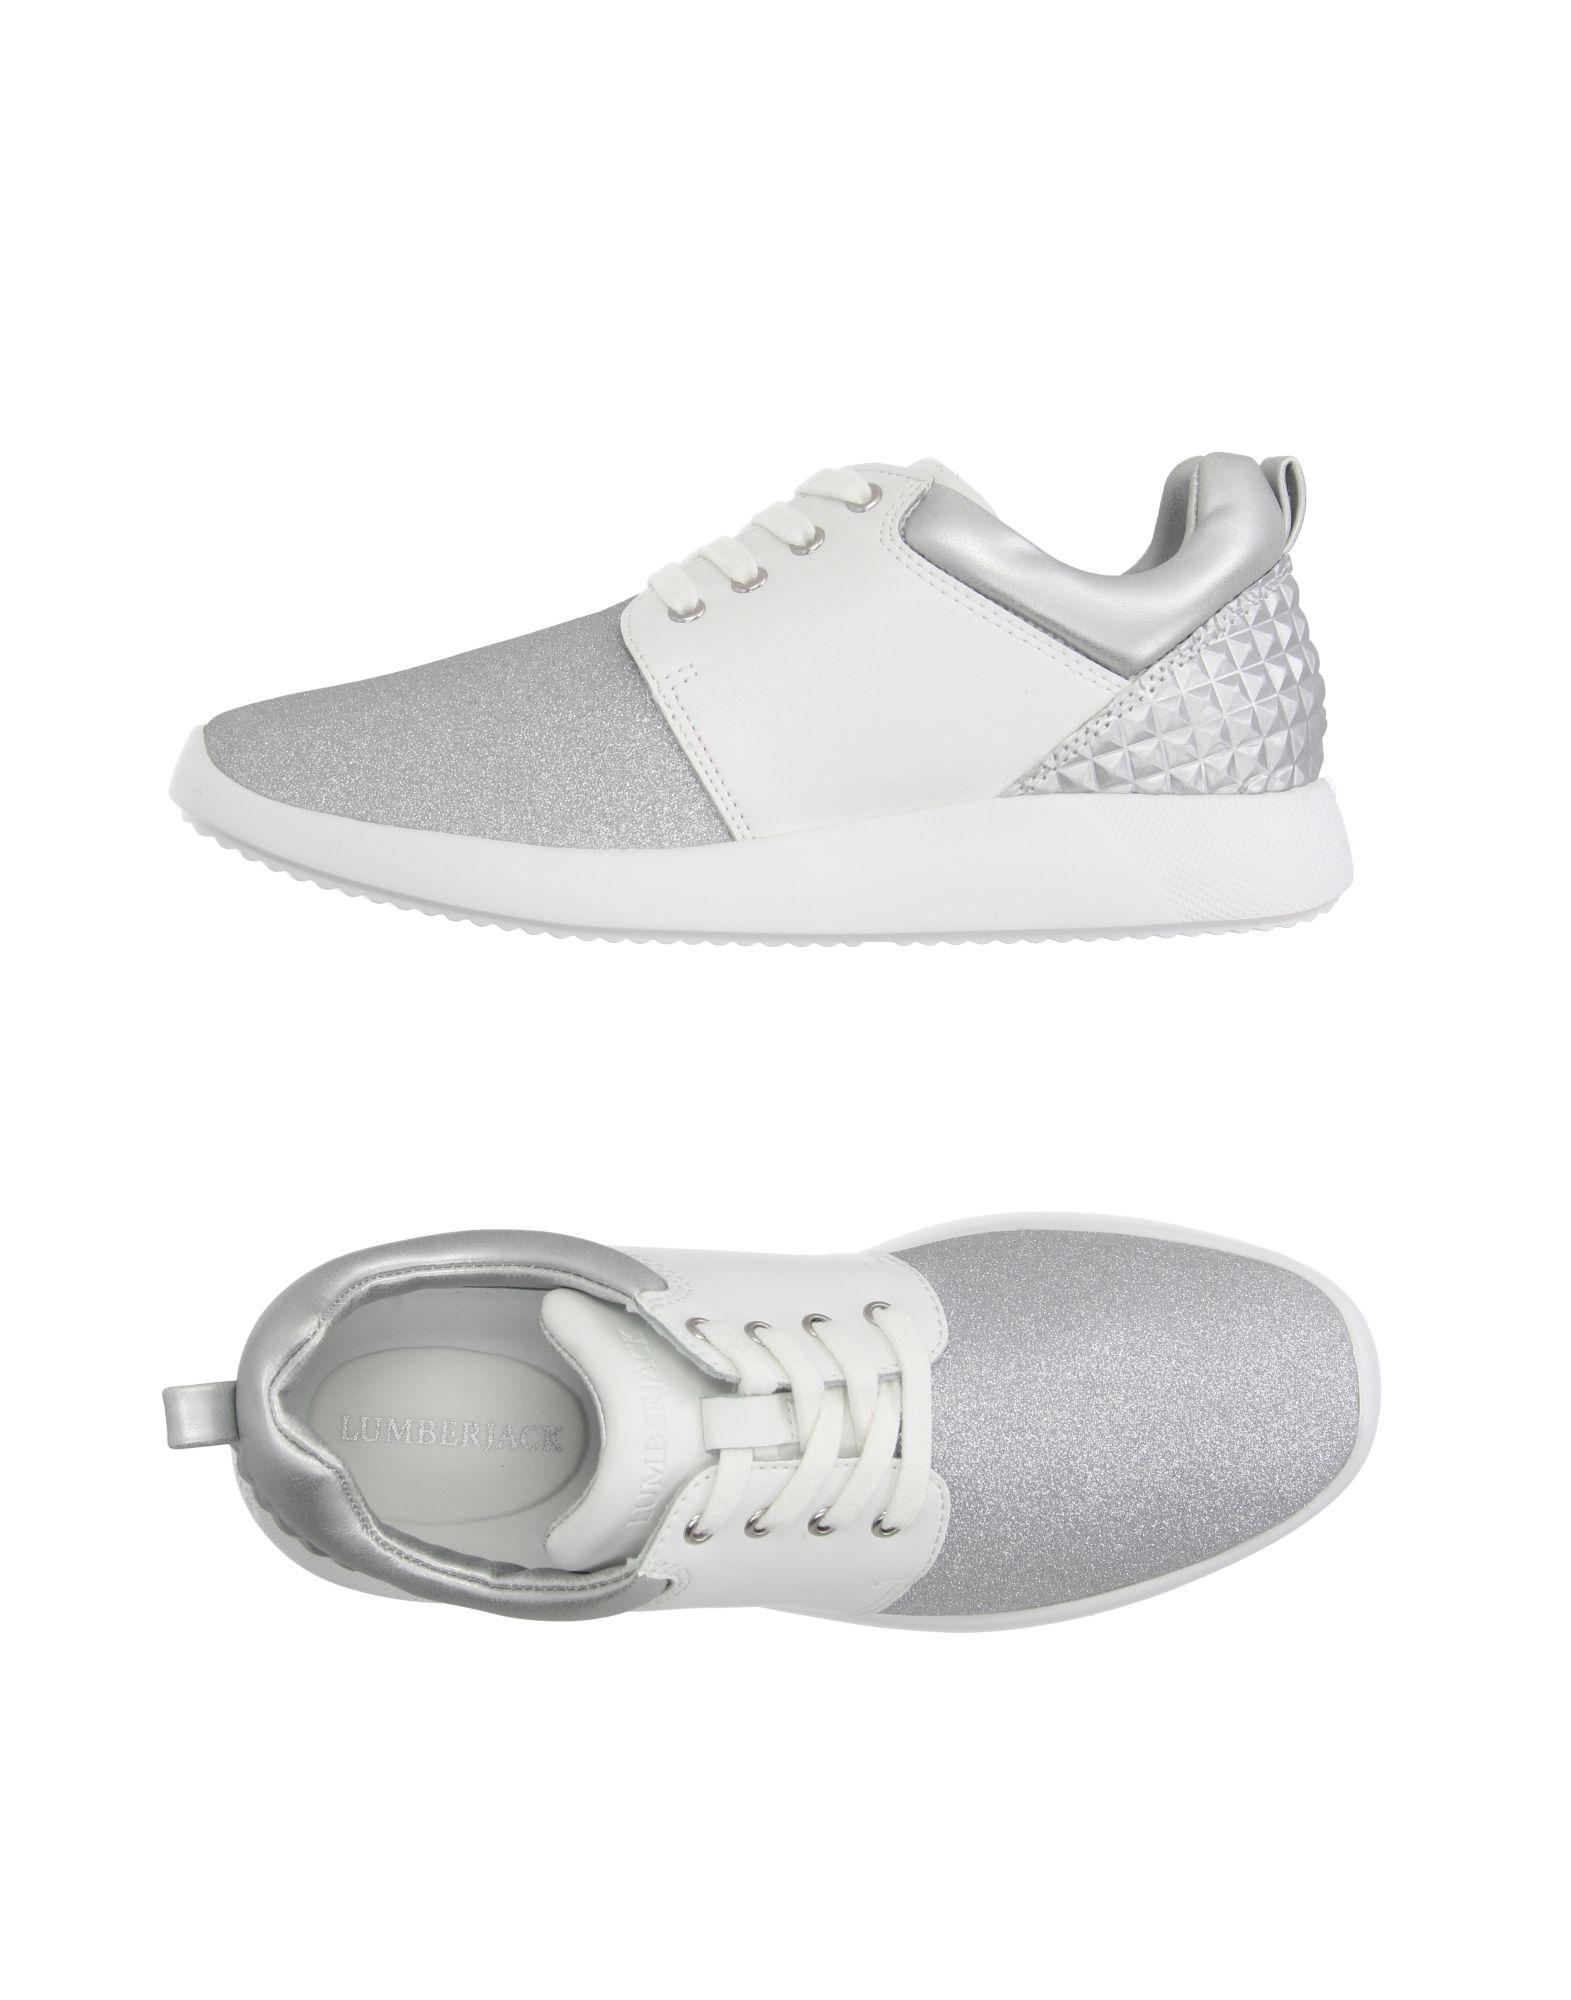 LUMBERJACK Damen Low Sneakers & Tennisschuhe Farbe Silber Größe 9 jetztbilligerkaufen